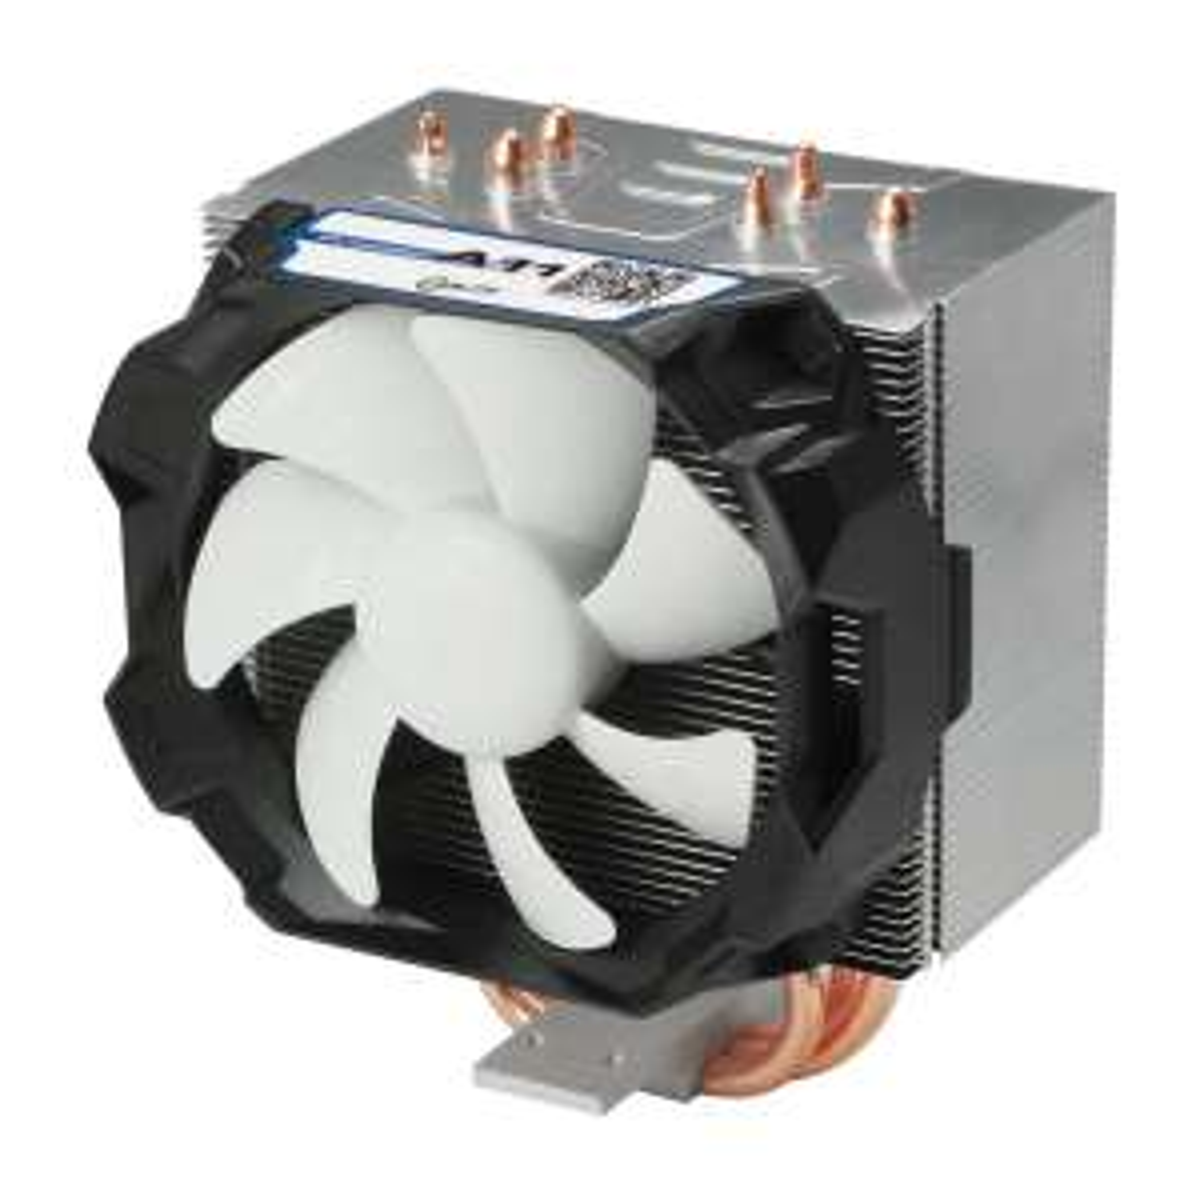 Arctic Freezer A11 CPU-Kühler (AMD Sockel) für 10,17€ [Amazon]